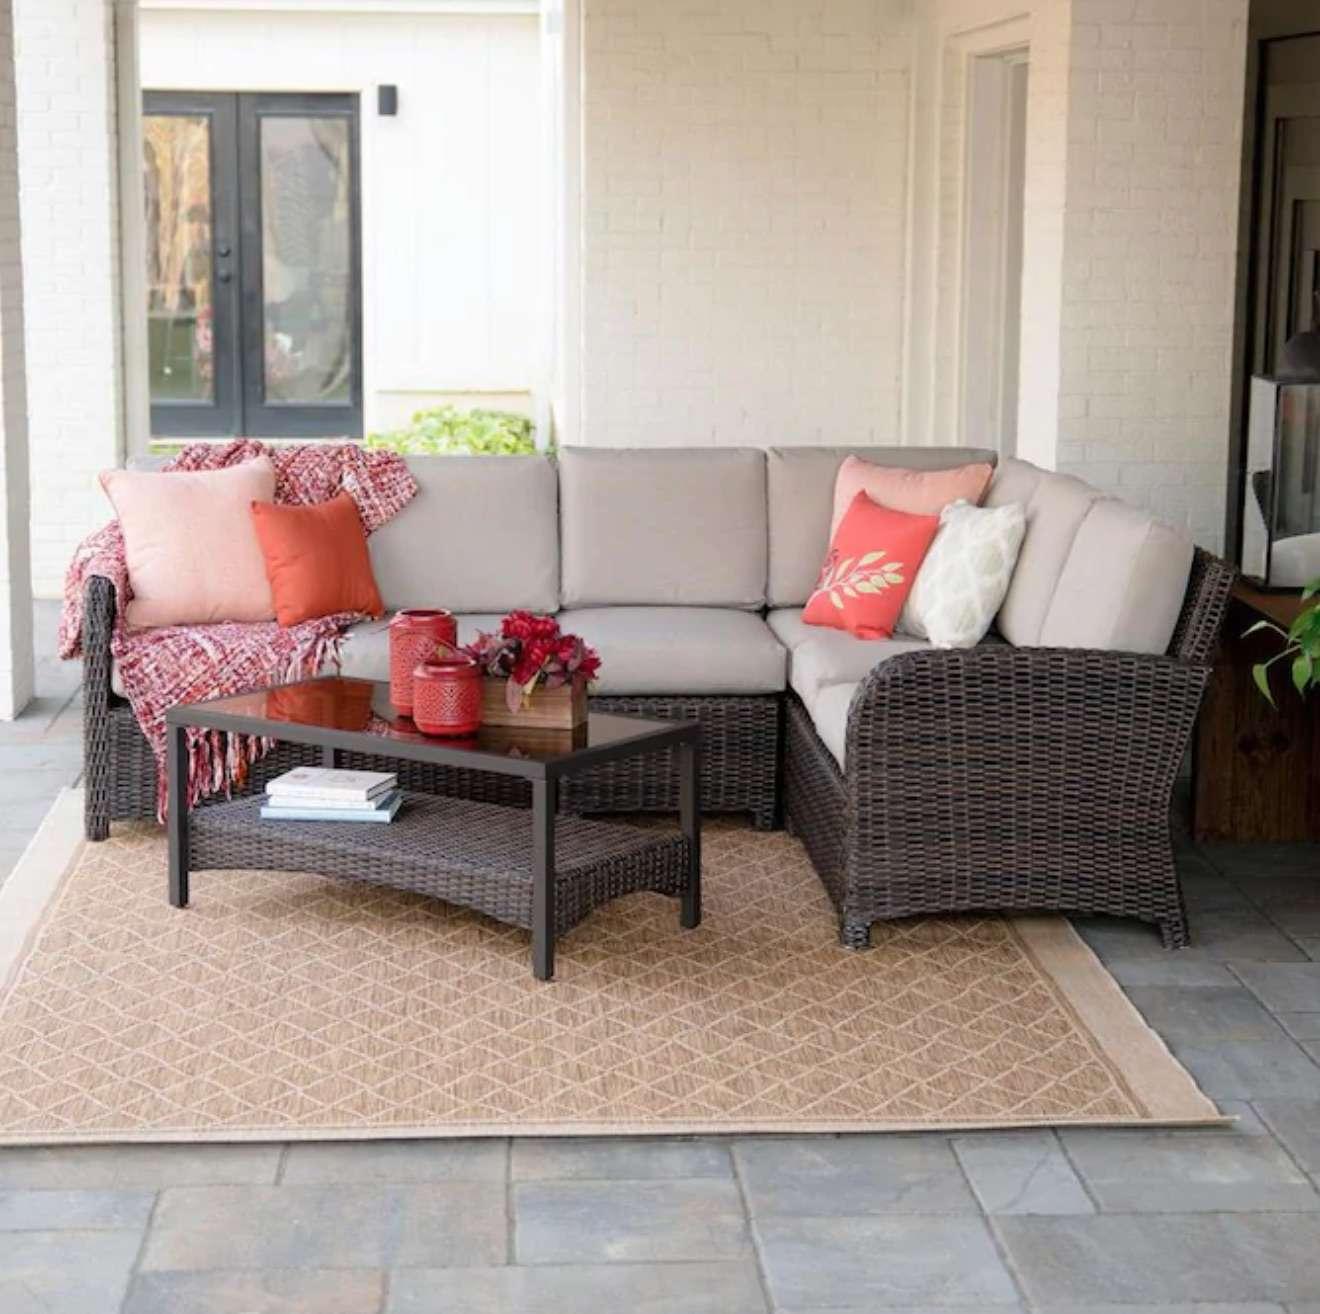 Jackson 5-Piece Metal Frame Patio Conversation Set with Cushions